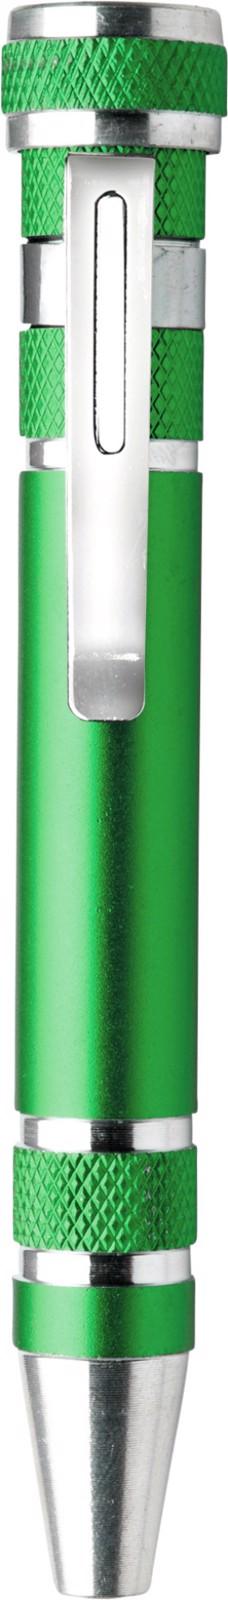 Aluminium pocket screwdriver - Light Green